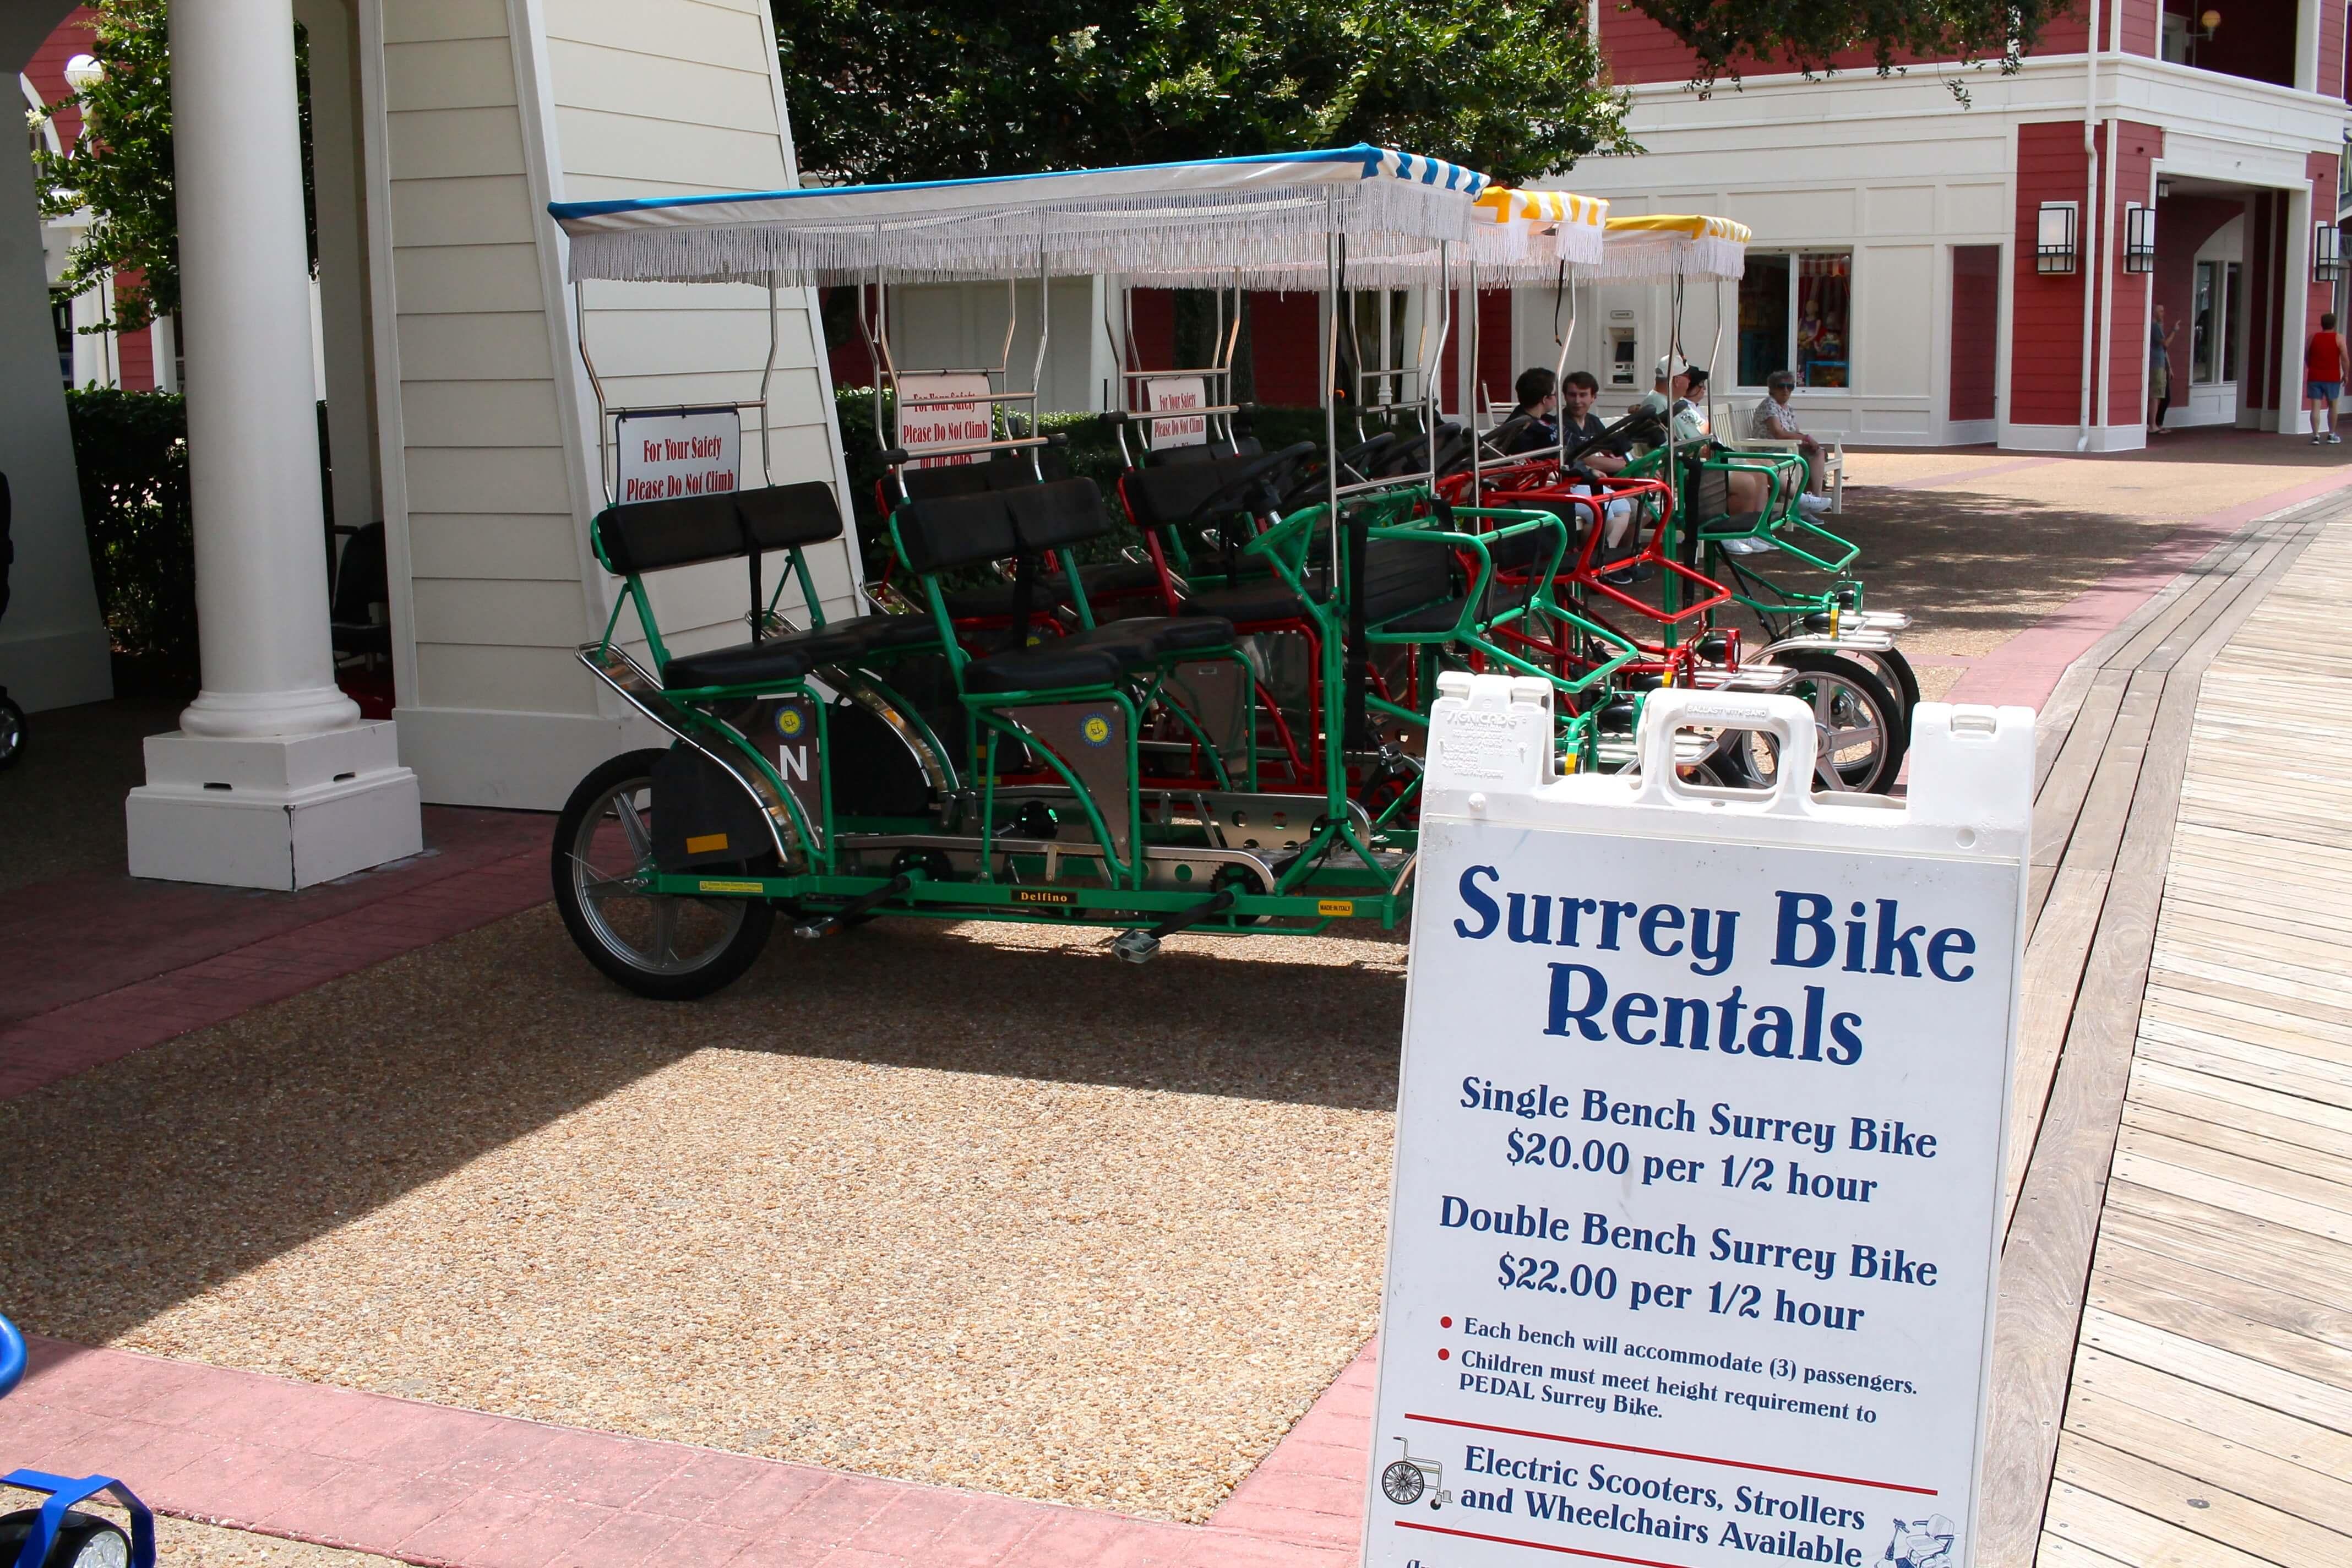 Surrey Bike Rentals at Disney's BoardWalk